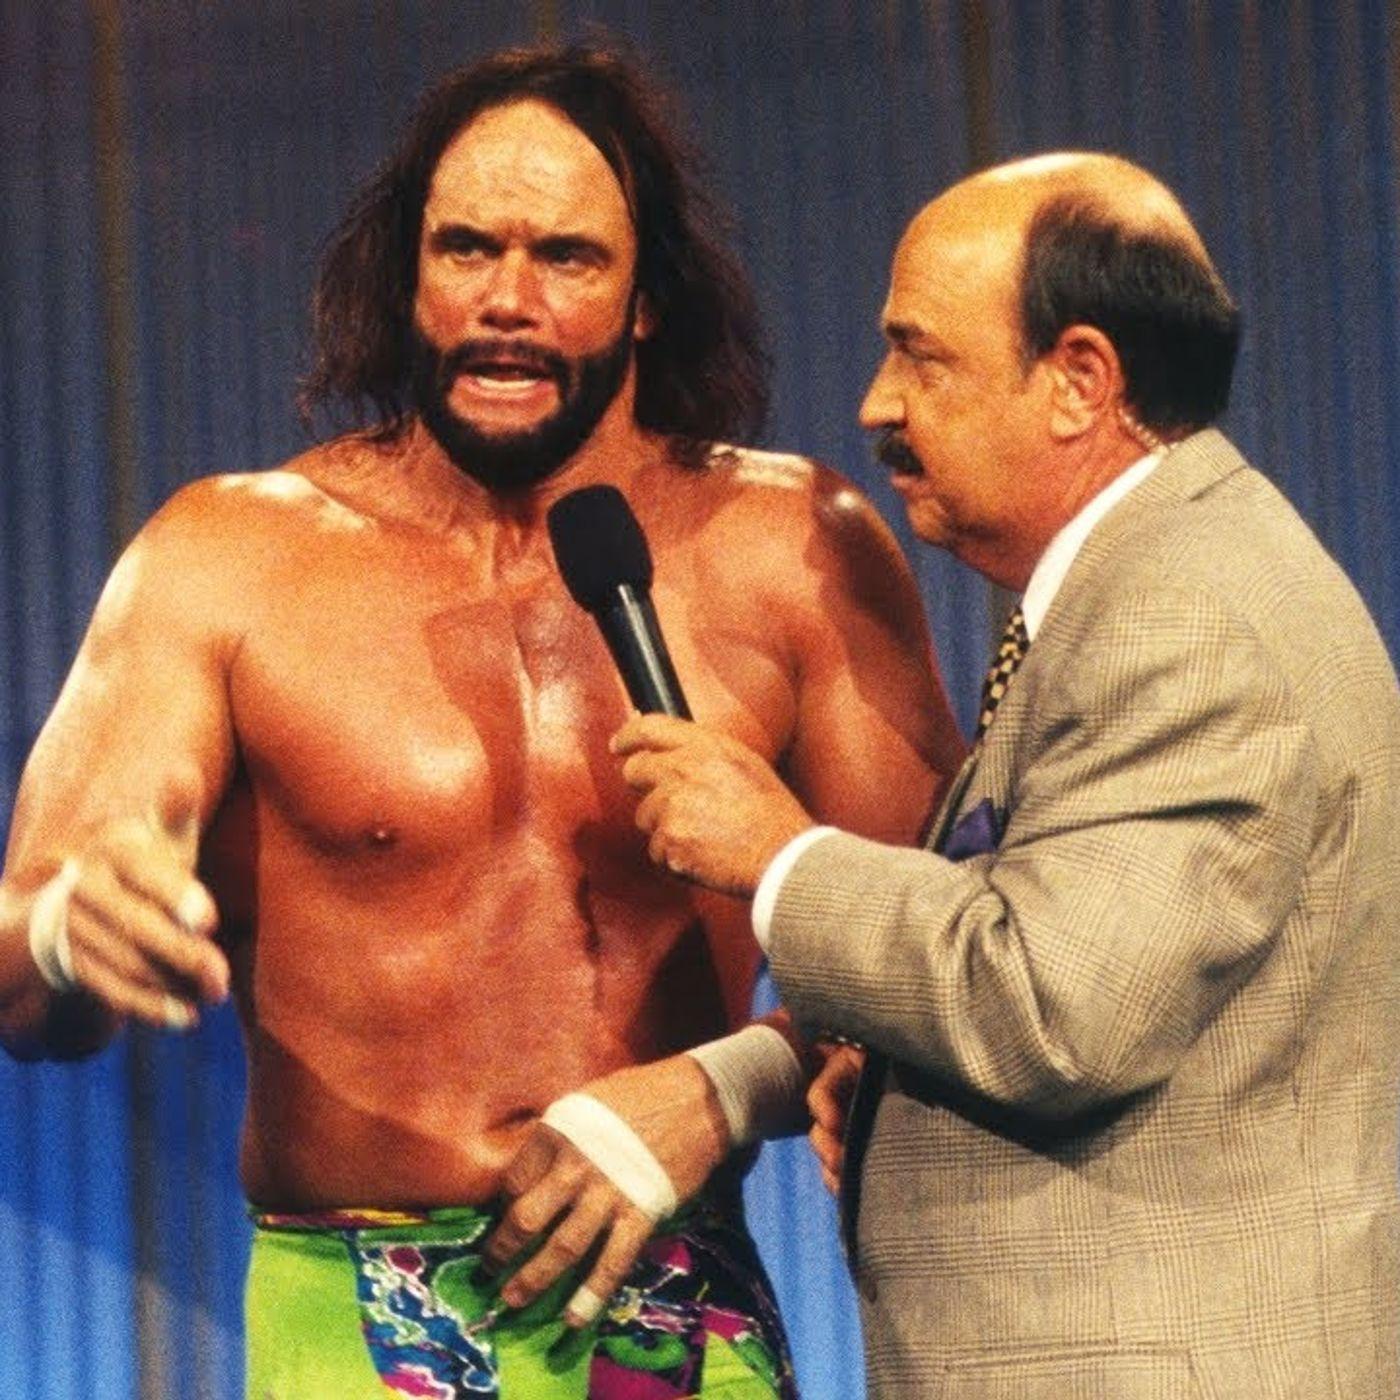 RI Free Radio Wrestling Talk: Episode #2